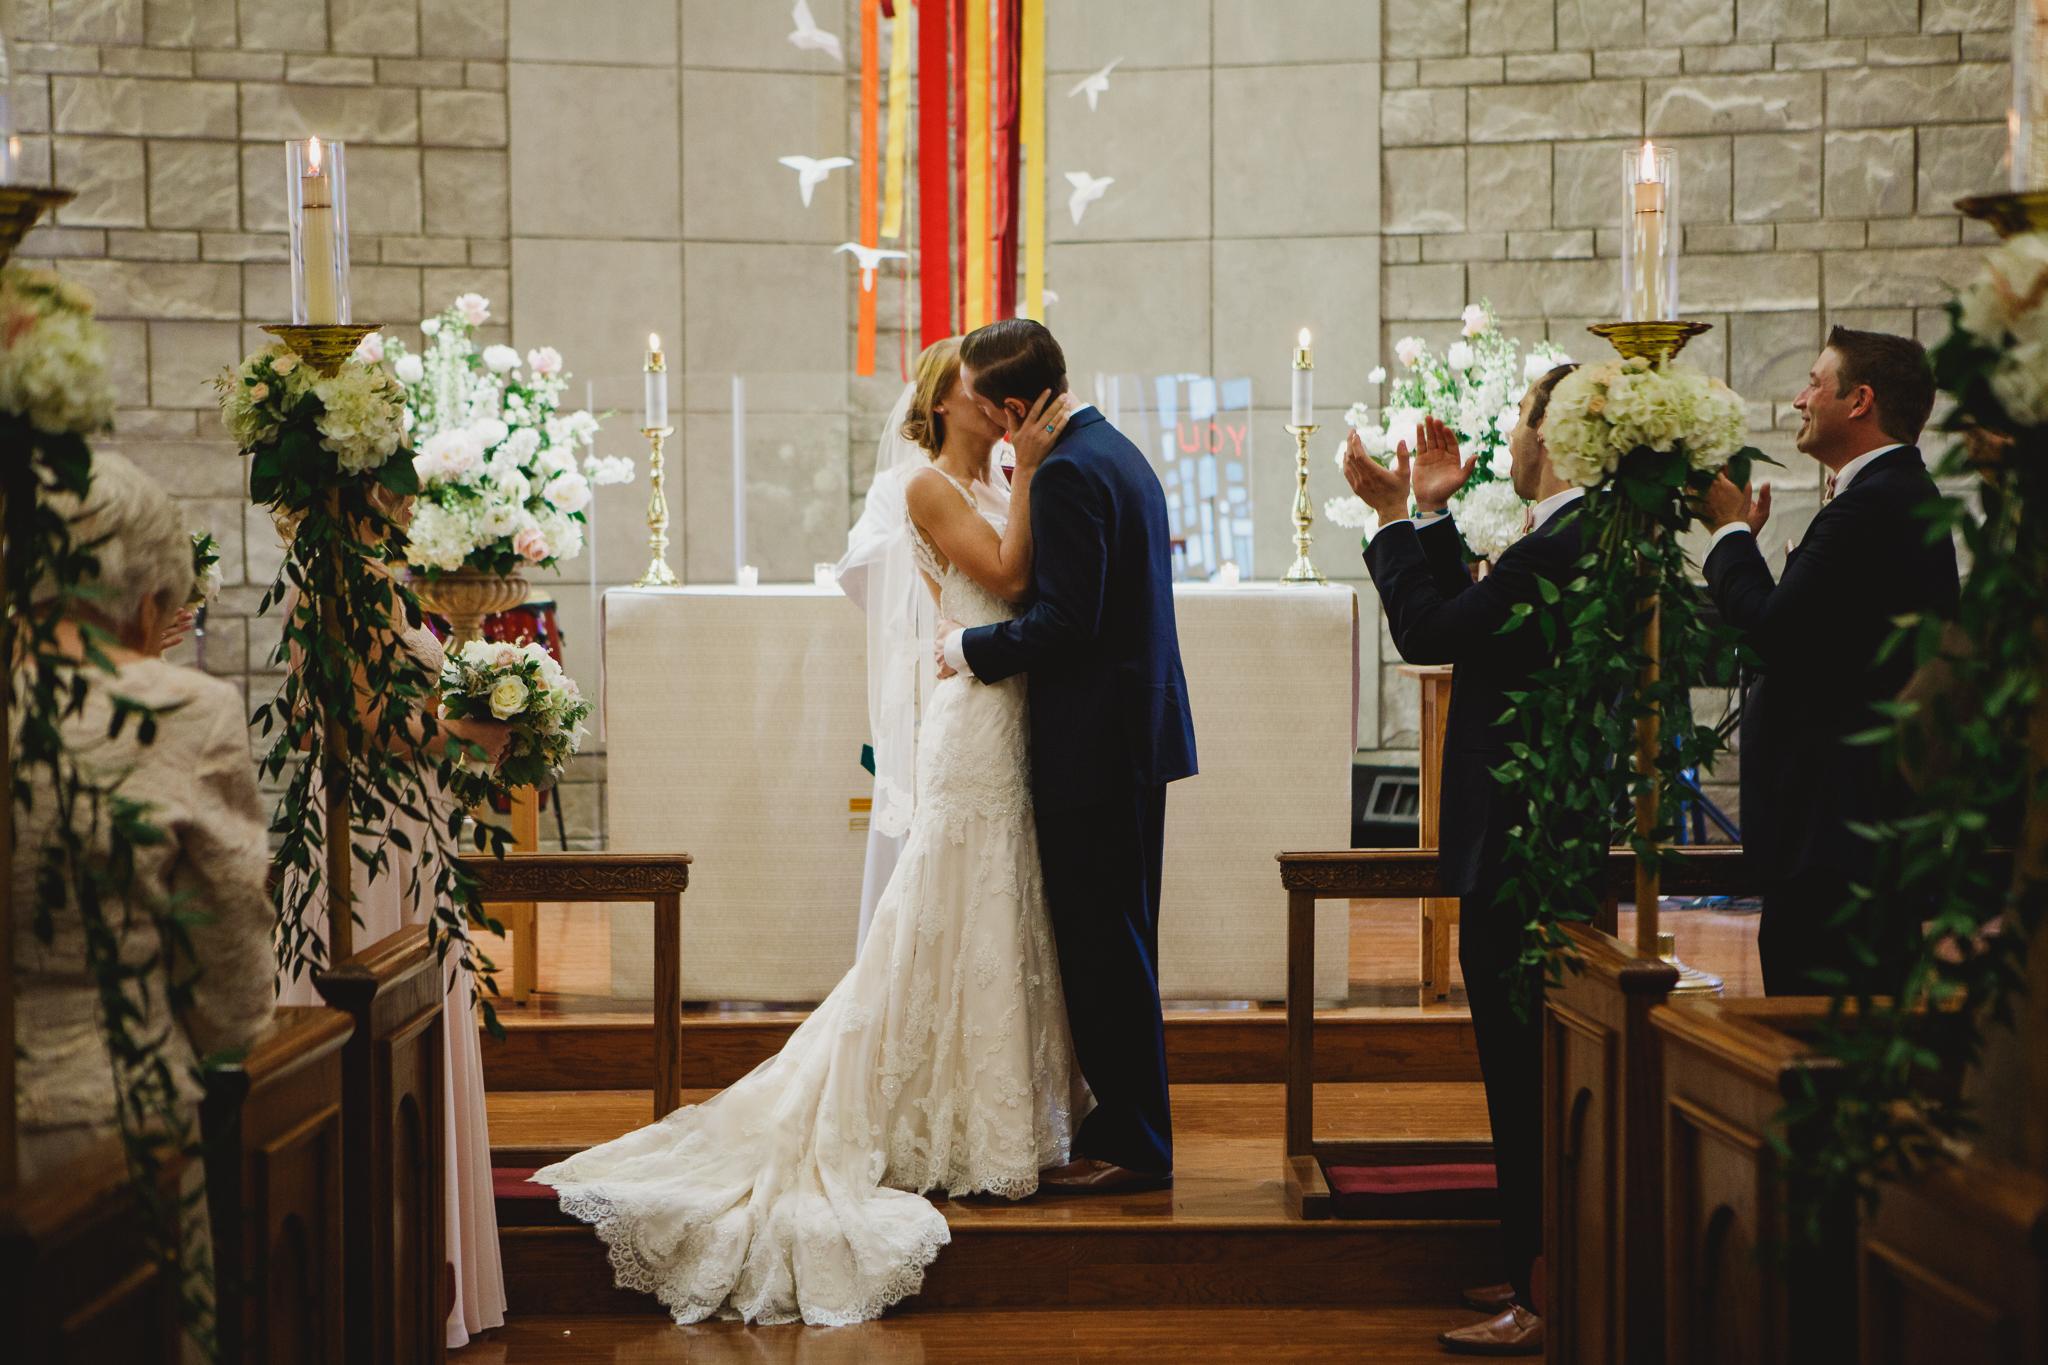 Michael and Kelly - the ashton depot - wedding DFW - wedding photographer- elizalde photography (54 of 150).jpg